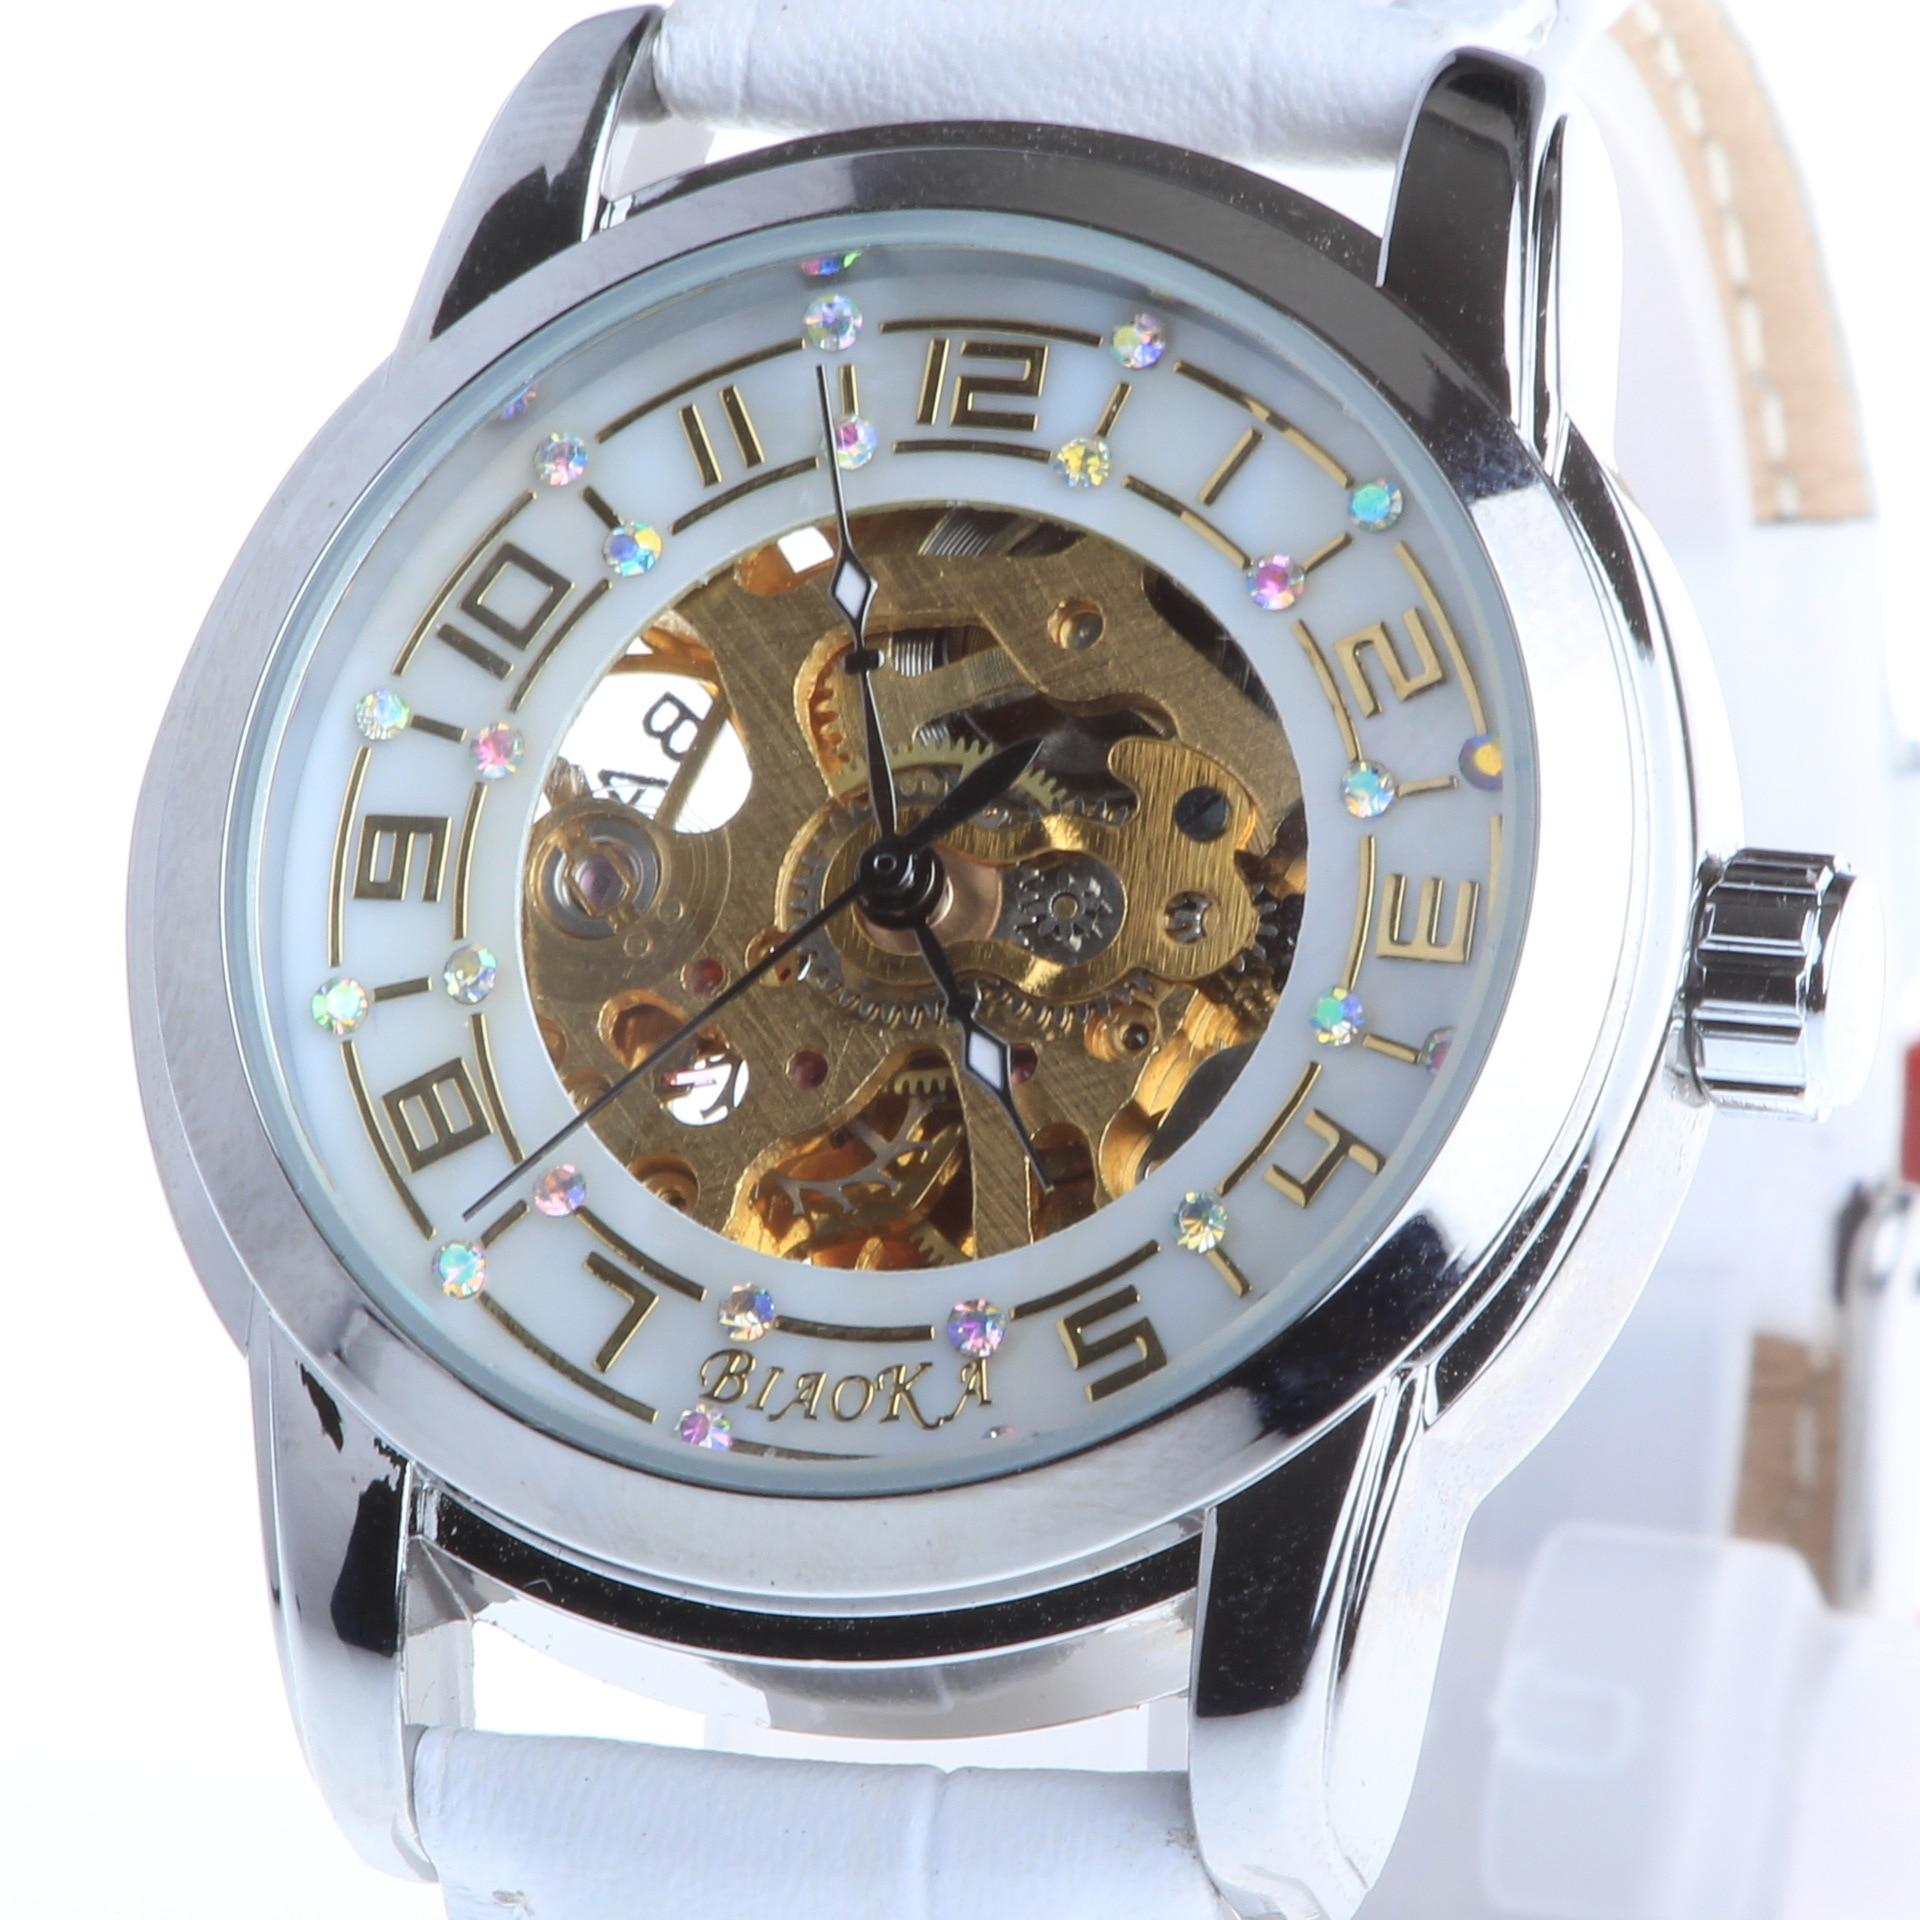 BIAOKA New Number Sport font b Design b font Bezel Watch Lady Watches font b Top